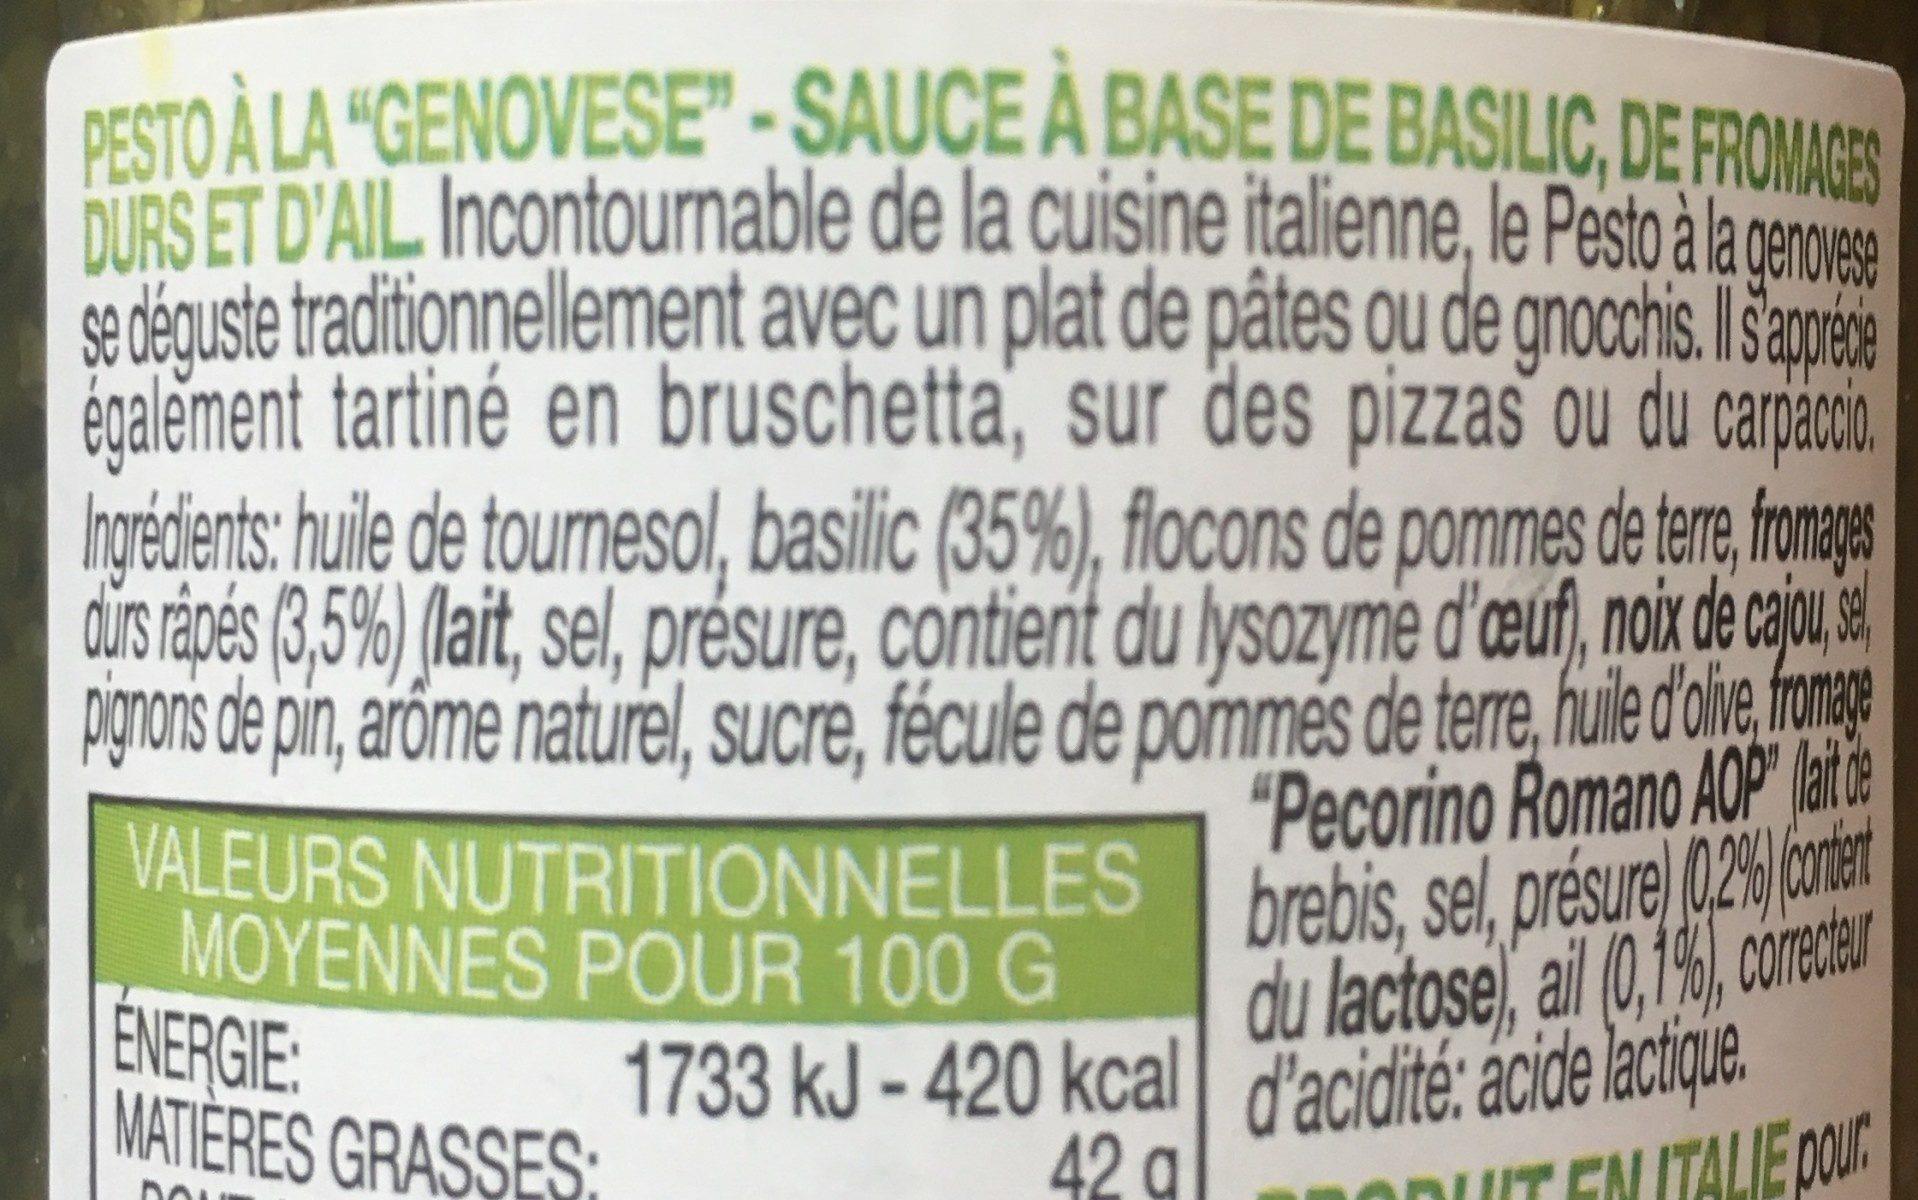 Le Pesto alla genovese Flarelli - Ingredients - fr